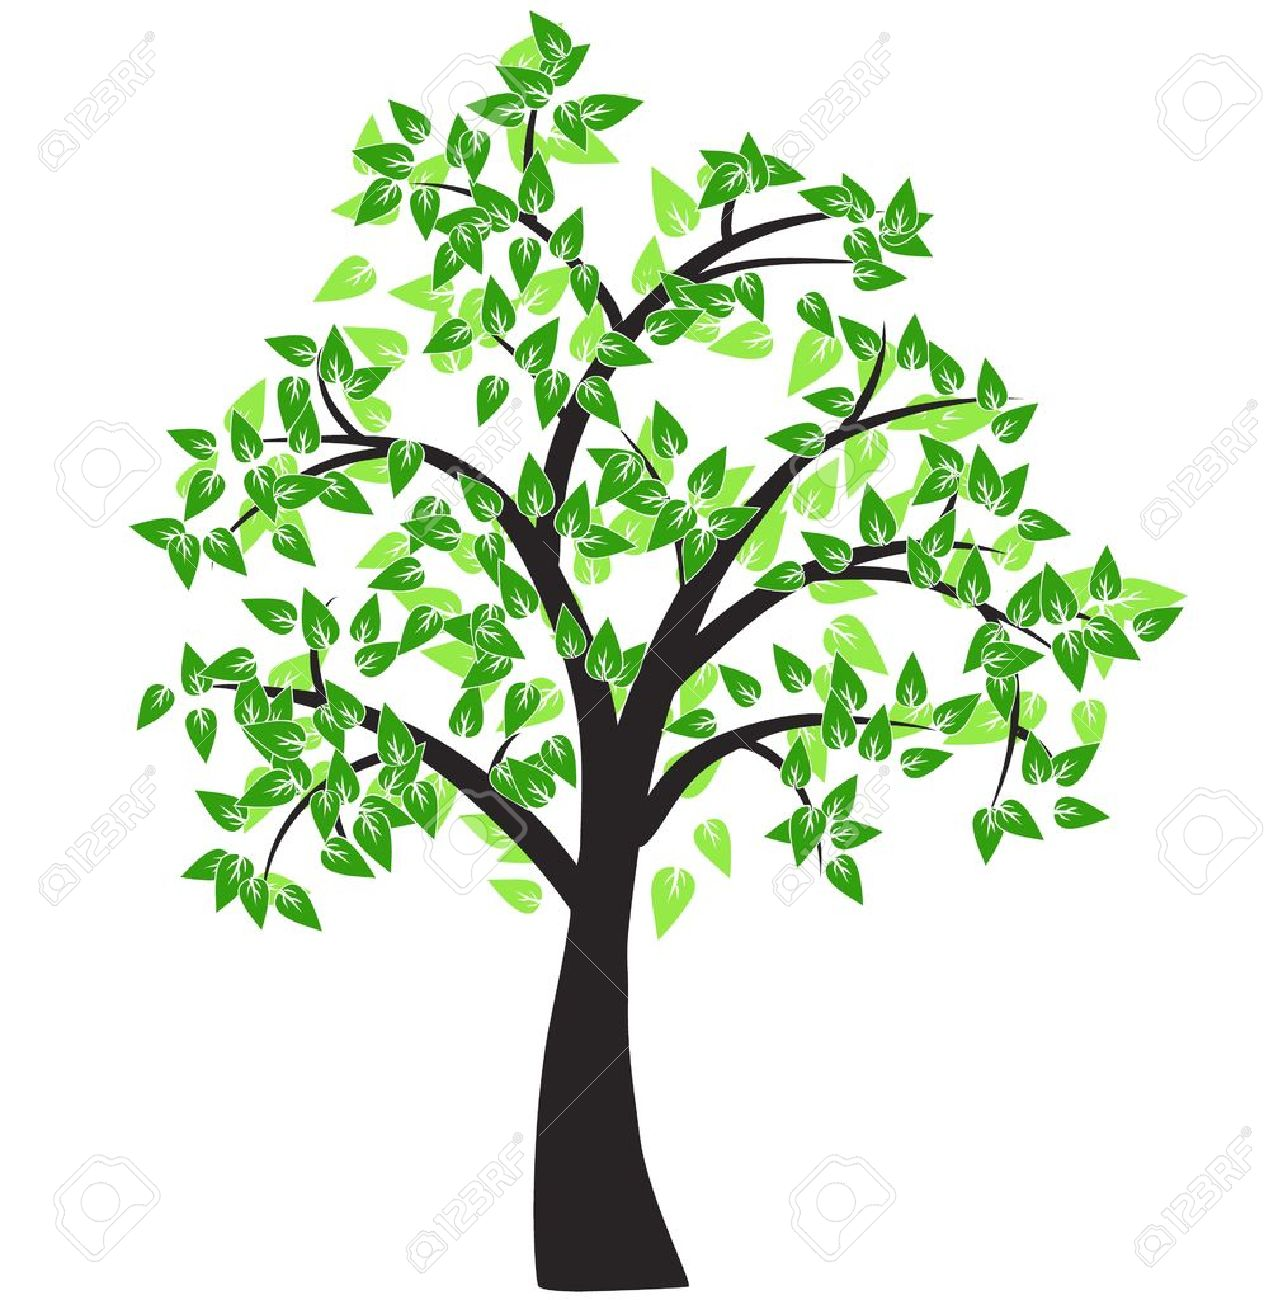 decorative tree royalty free cliparts vectors and stock